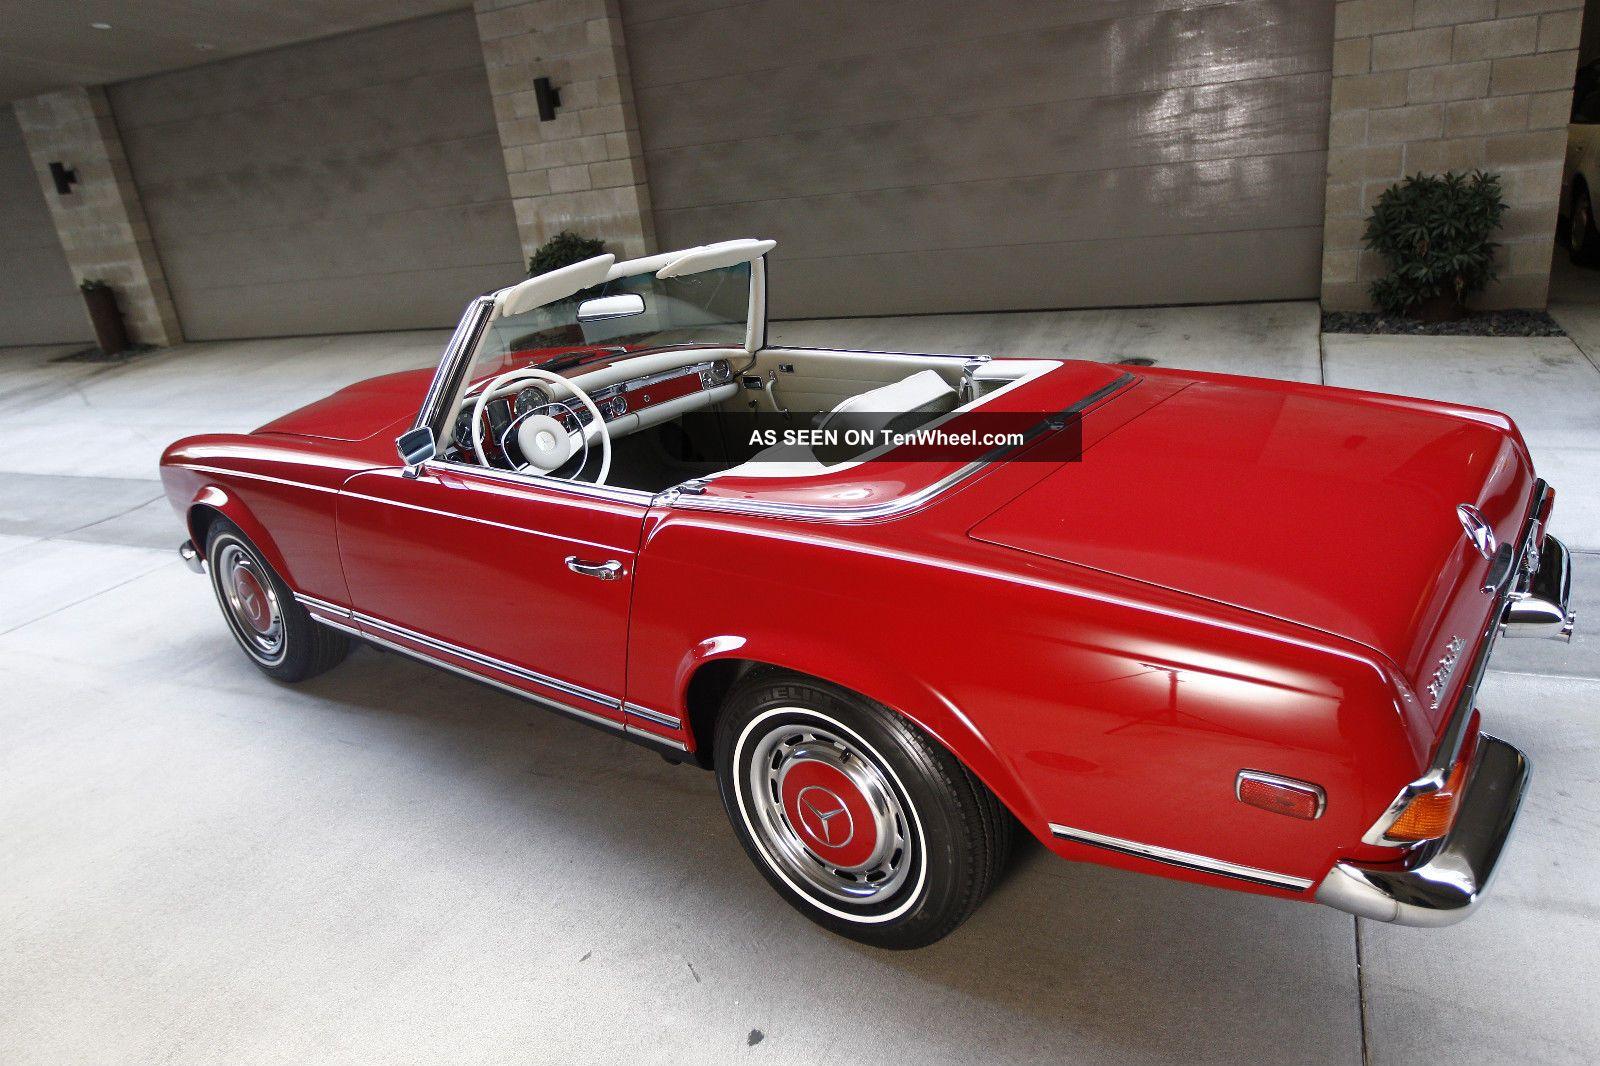 1969 mercedes benz pagoda 280sl 280 sl convertible coupe. Black Bedroom Furniture Sets. Home Design Ideas